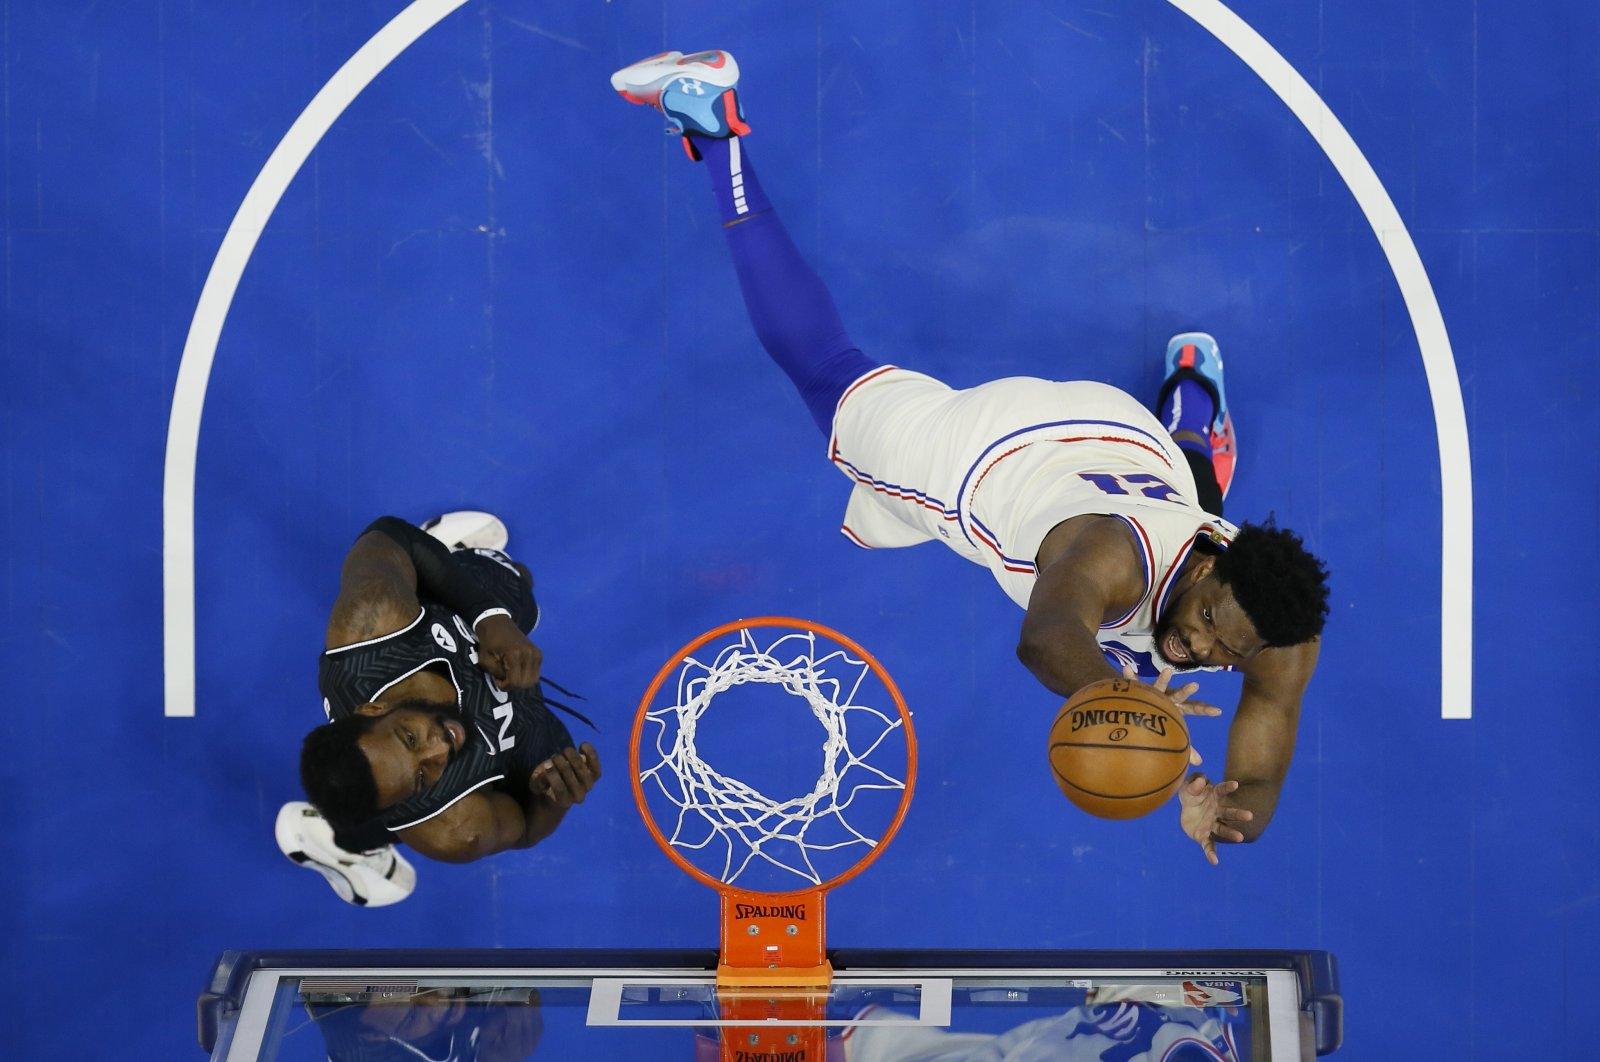 Philadelphia 76ers' Joel Embiid (R) goes up for a shot against Brooklyn Nets' Jeff Green during an NBA game, Philadelphia, U.S. April 14, 2021. (AP Photo)